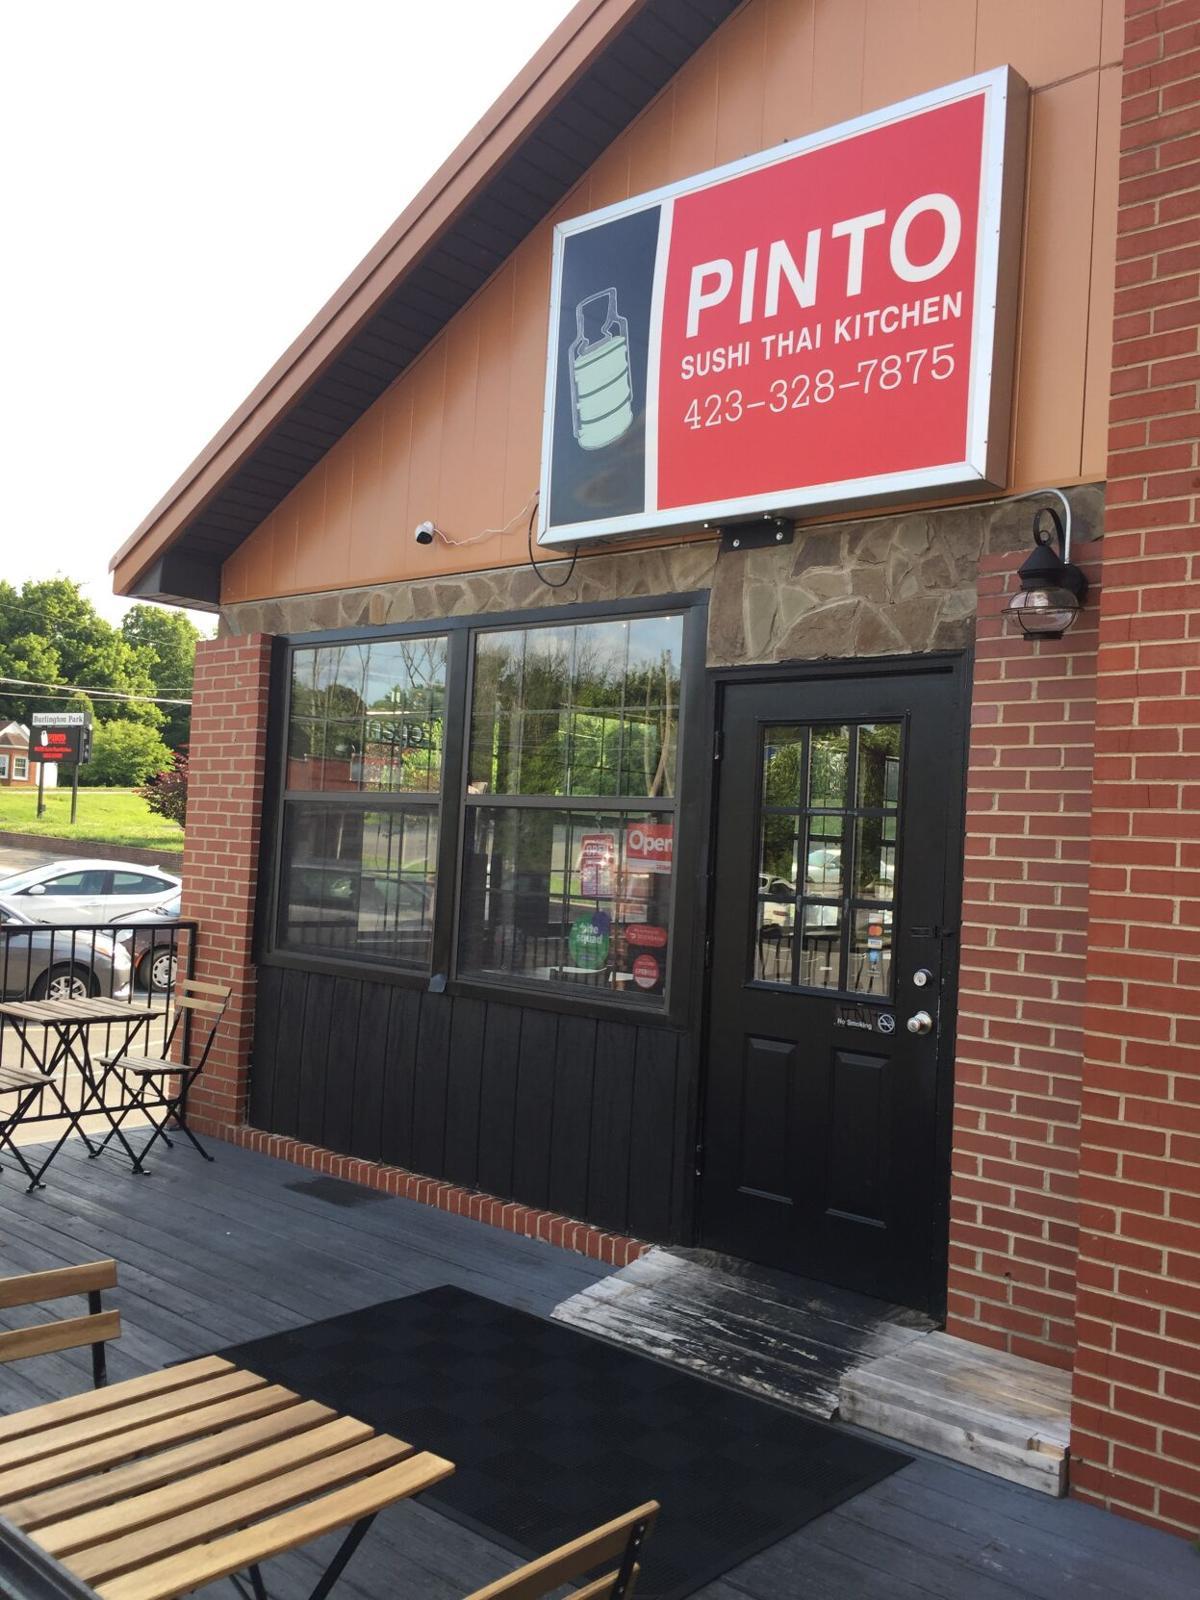 Pinto Sushi Thai Exterior 1.JPG